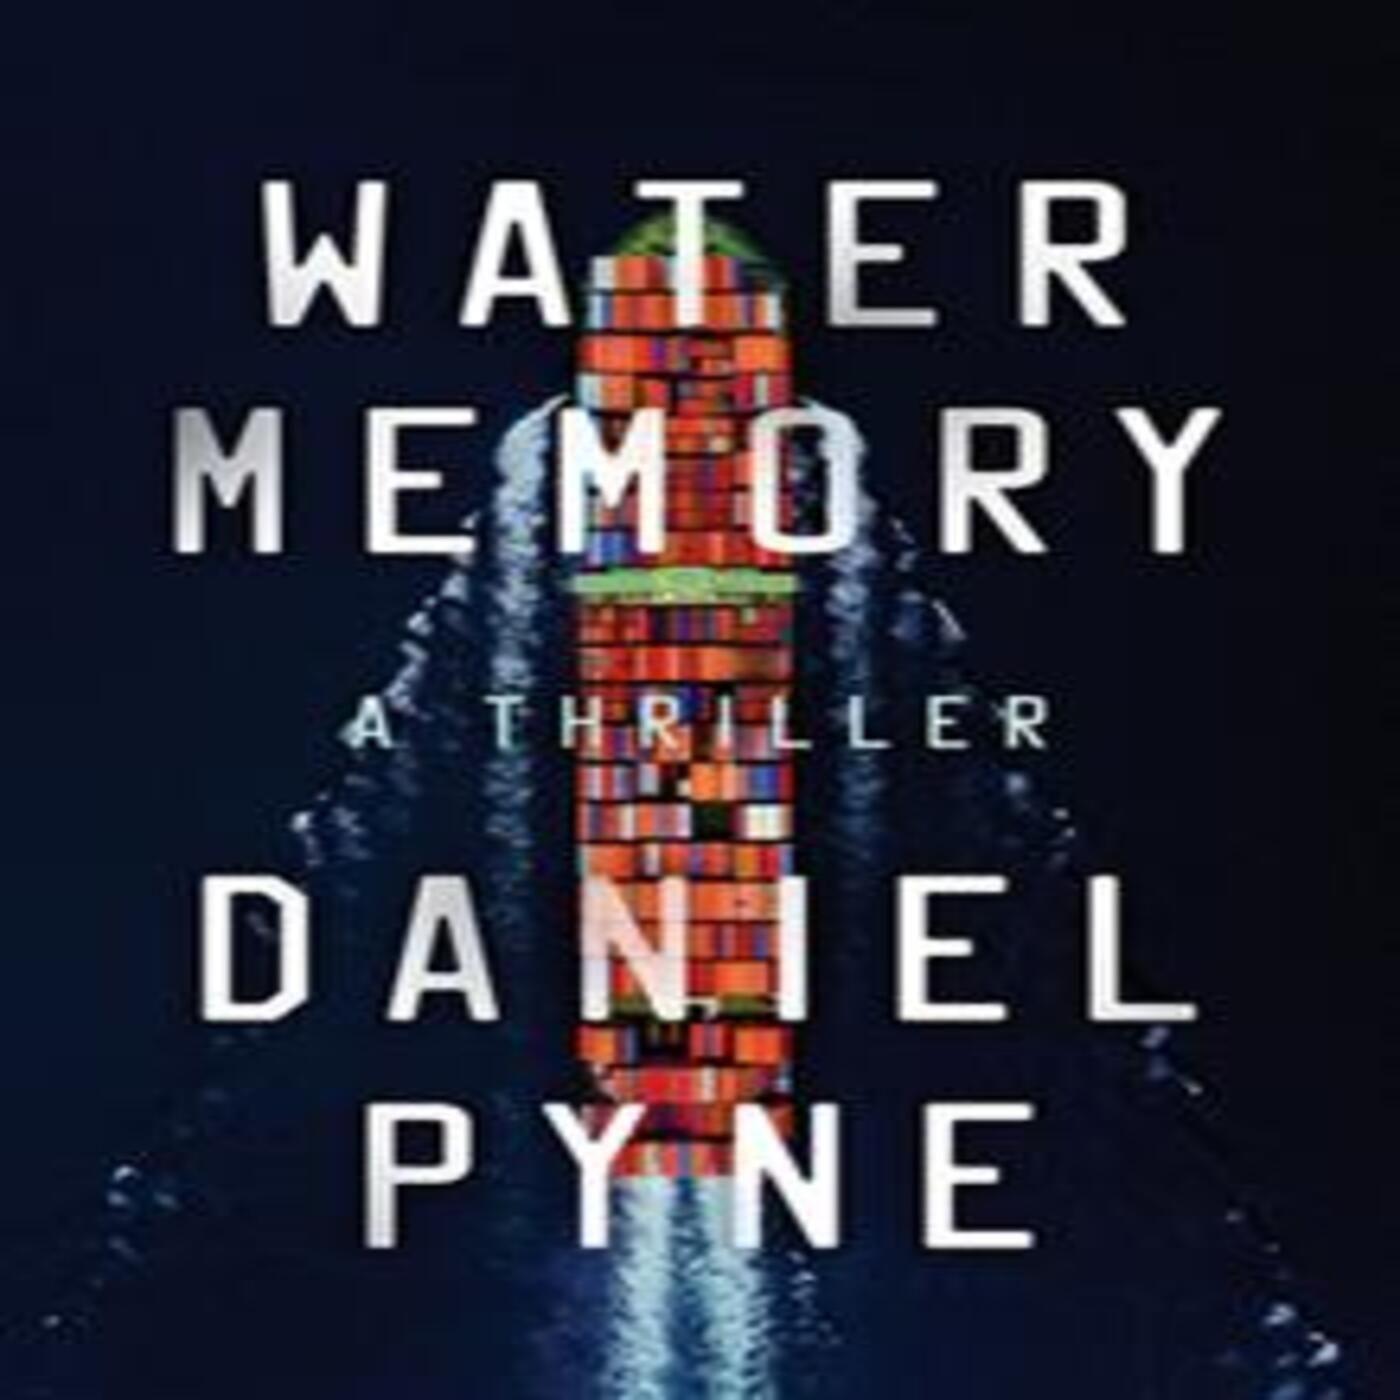 Daniel Pyne -Water Memory (Aubrey Sentro #1)